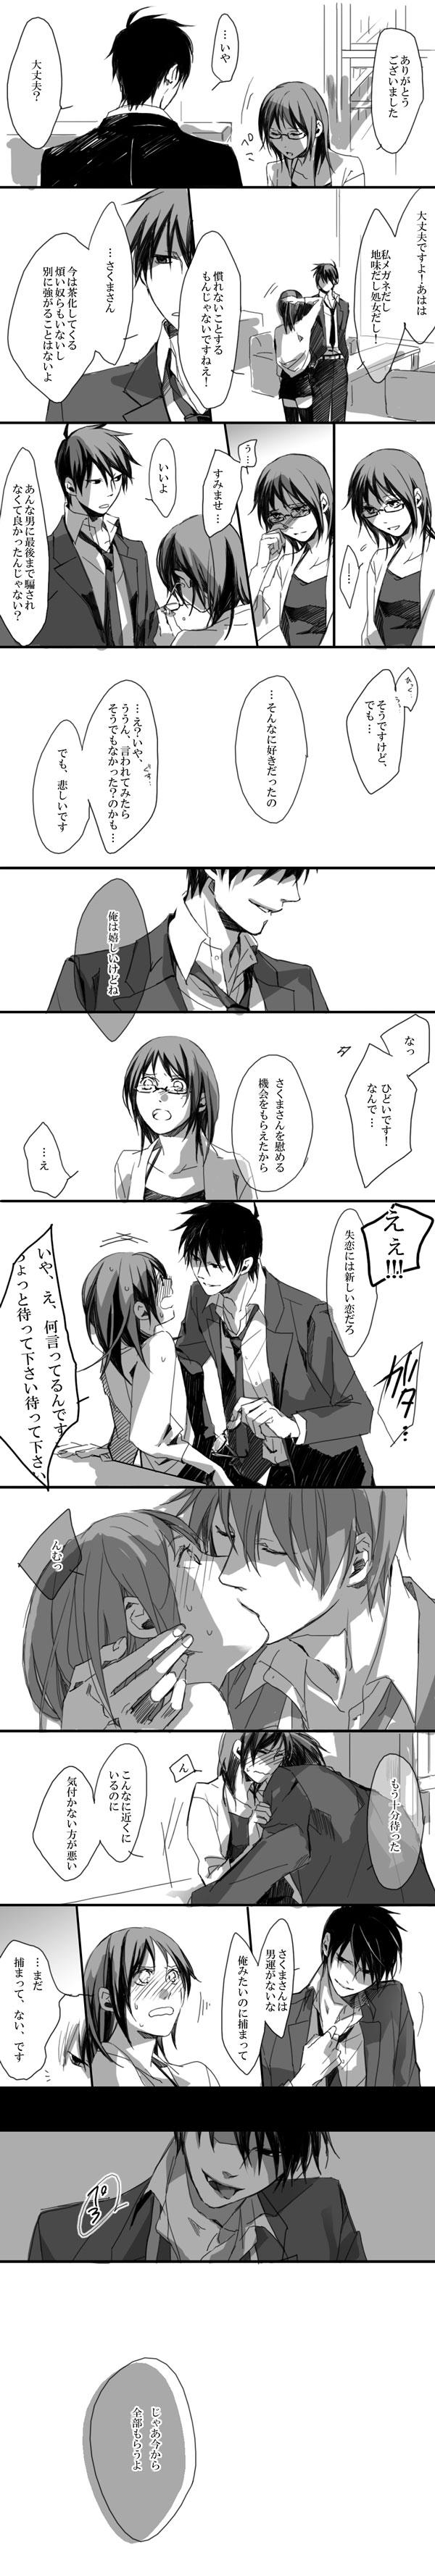 Tags: Anime, Pixiv Id 96648, Yondemasuyo Azazel-san, Sakuma Rinko, Akutabe, Translation Request